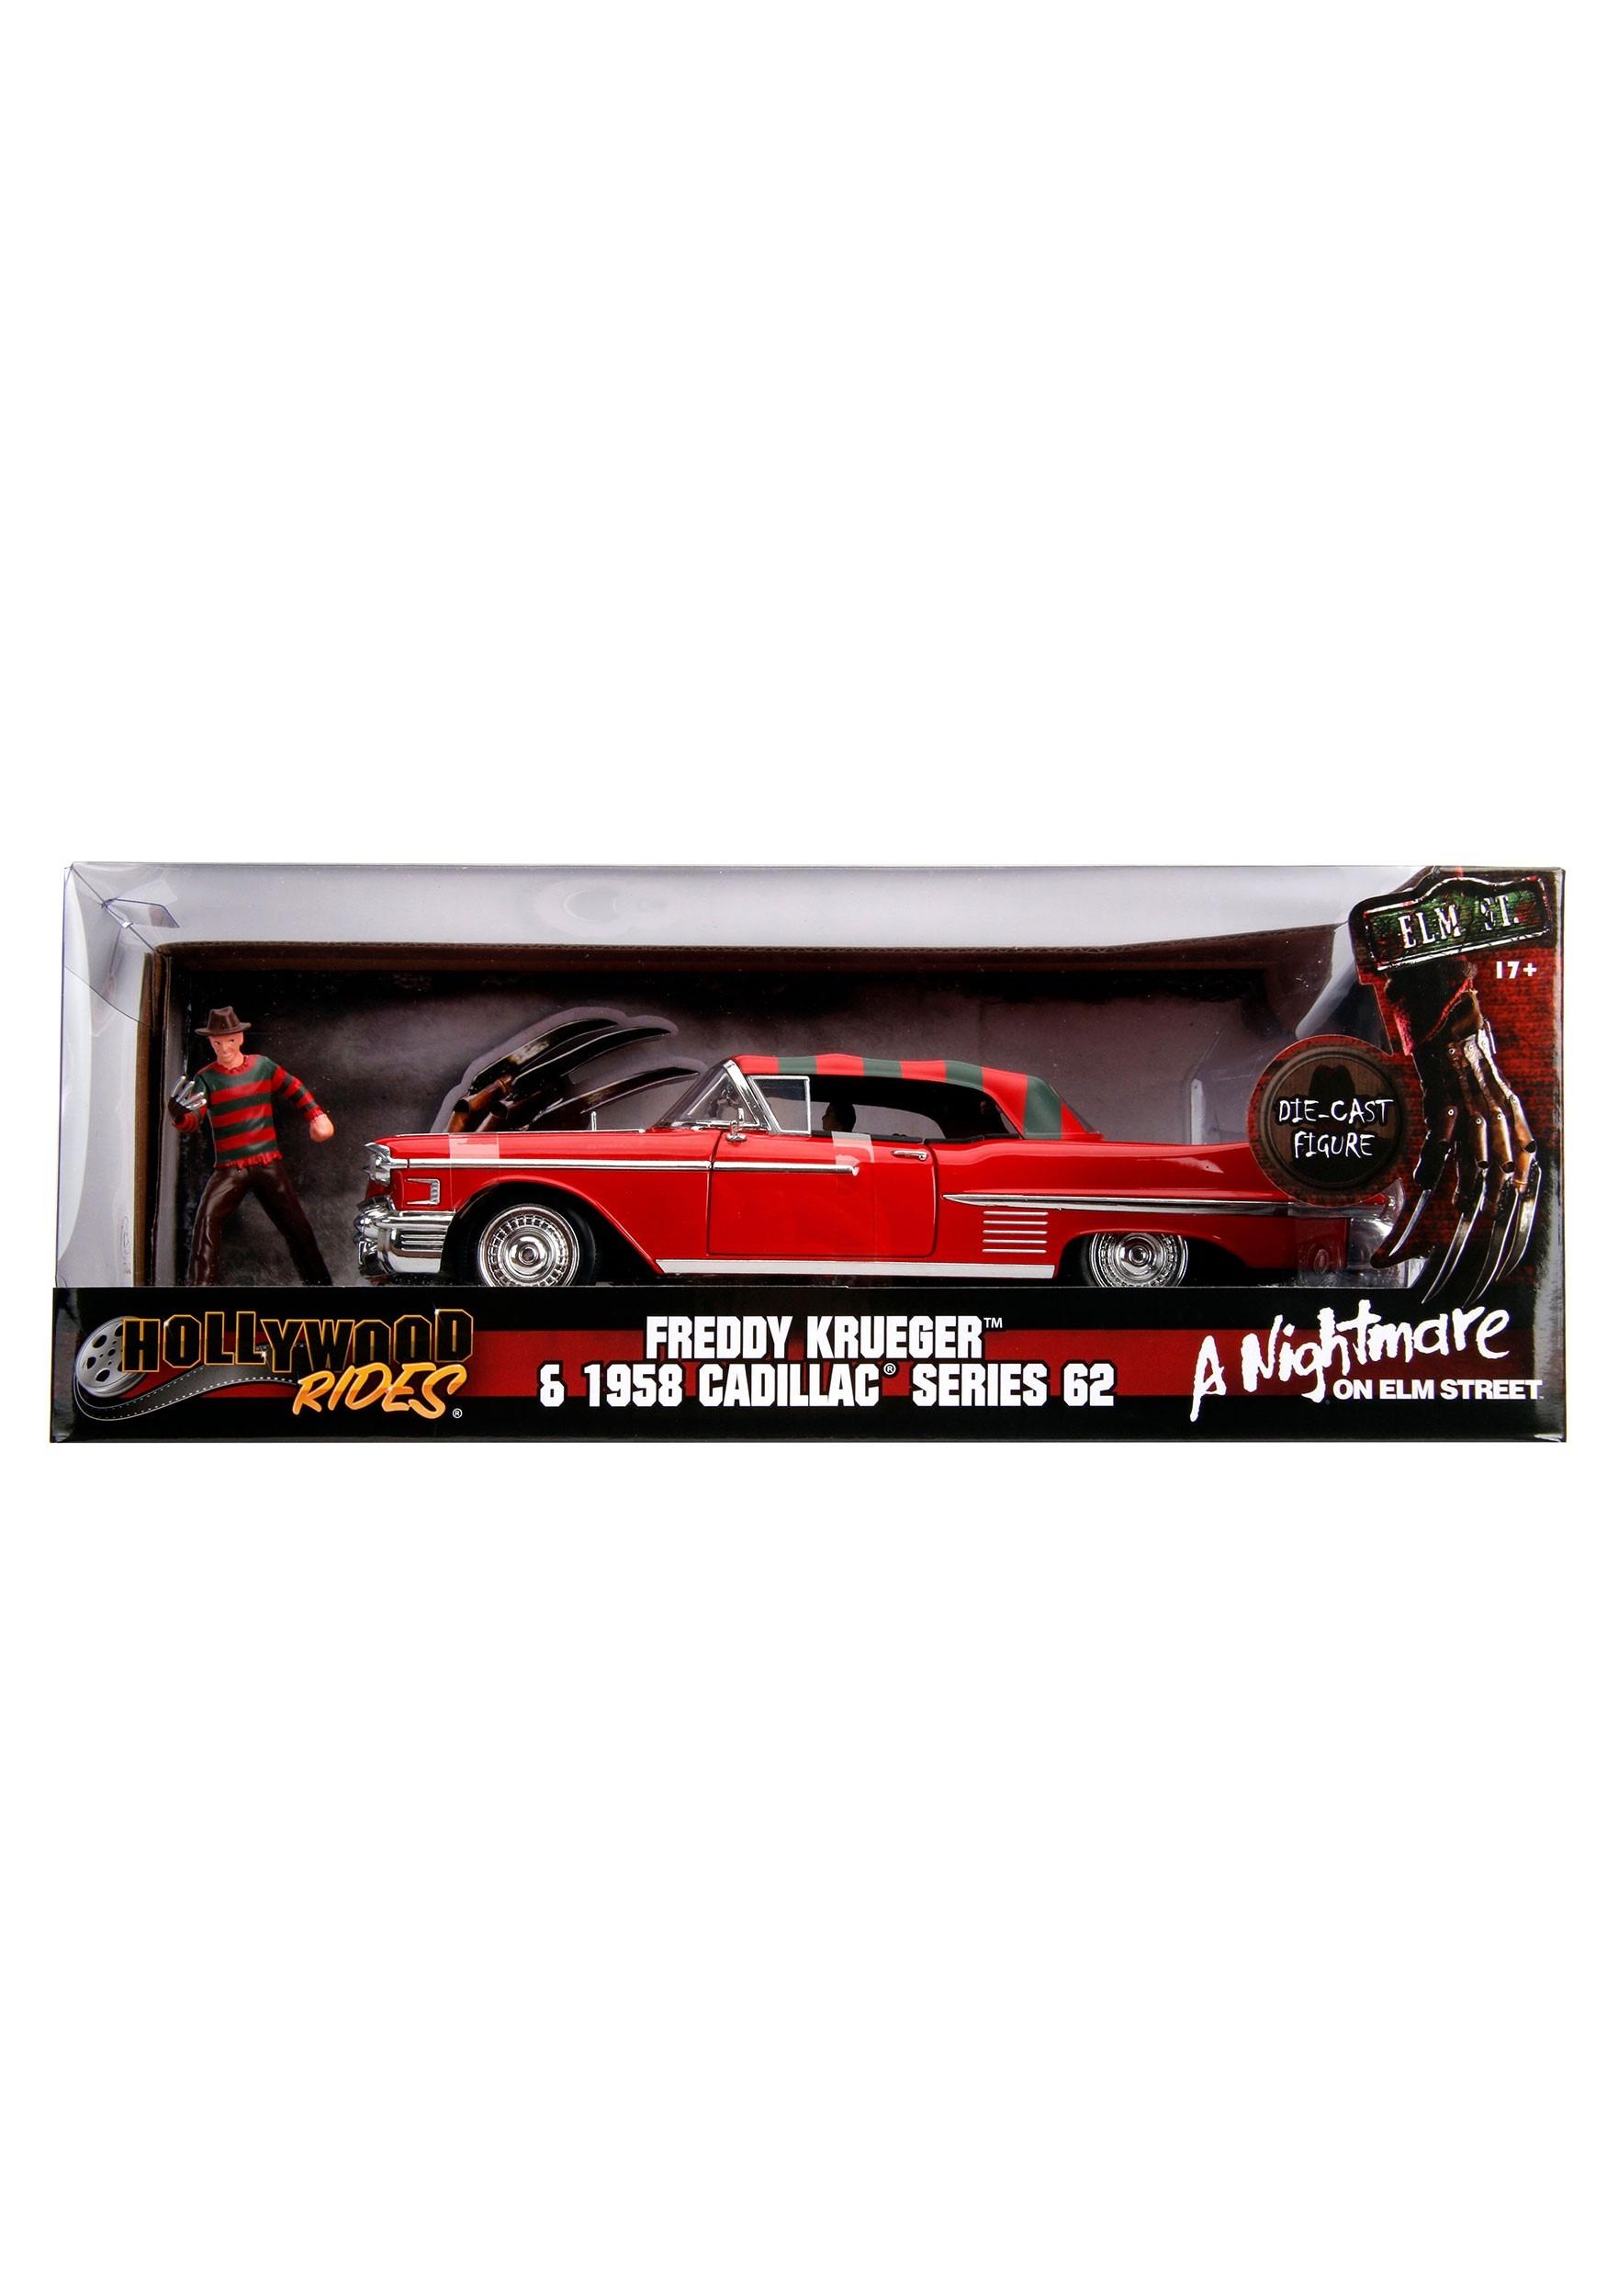 Nightmare on Elm Street 1957 Cadillac with Freddy Krueger Figure